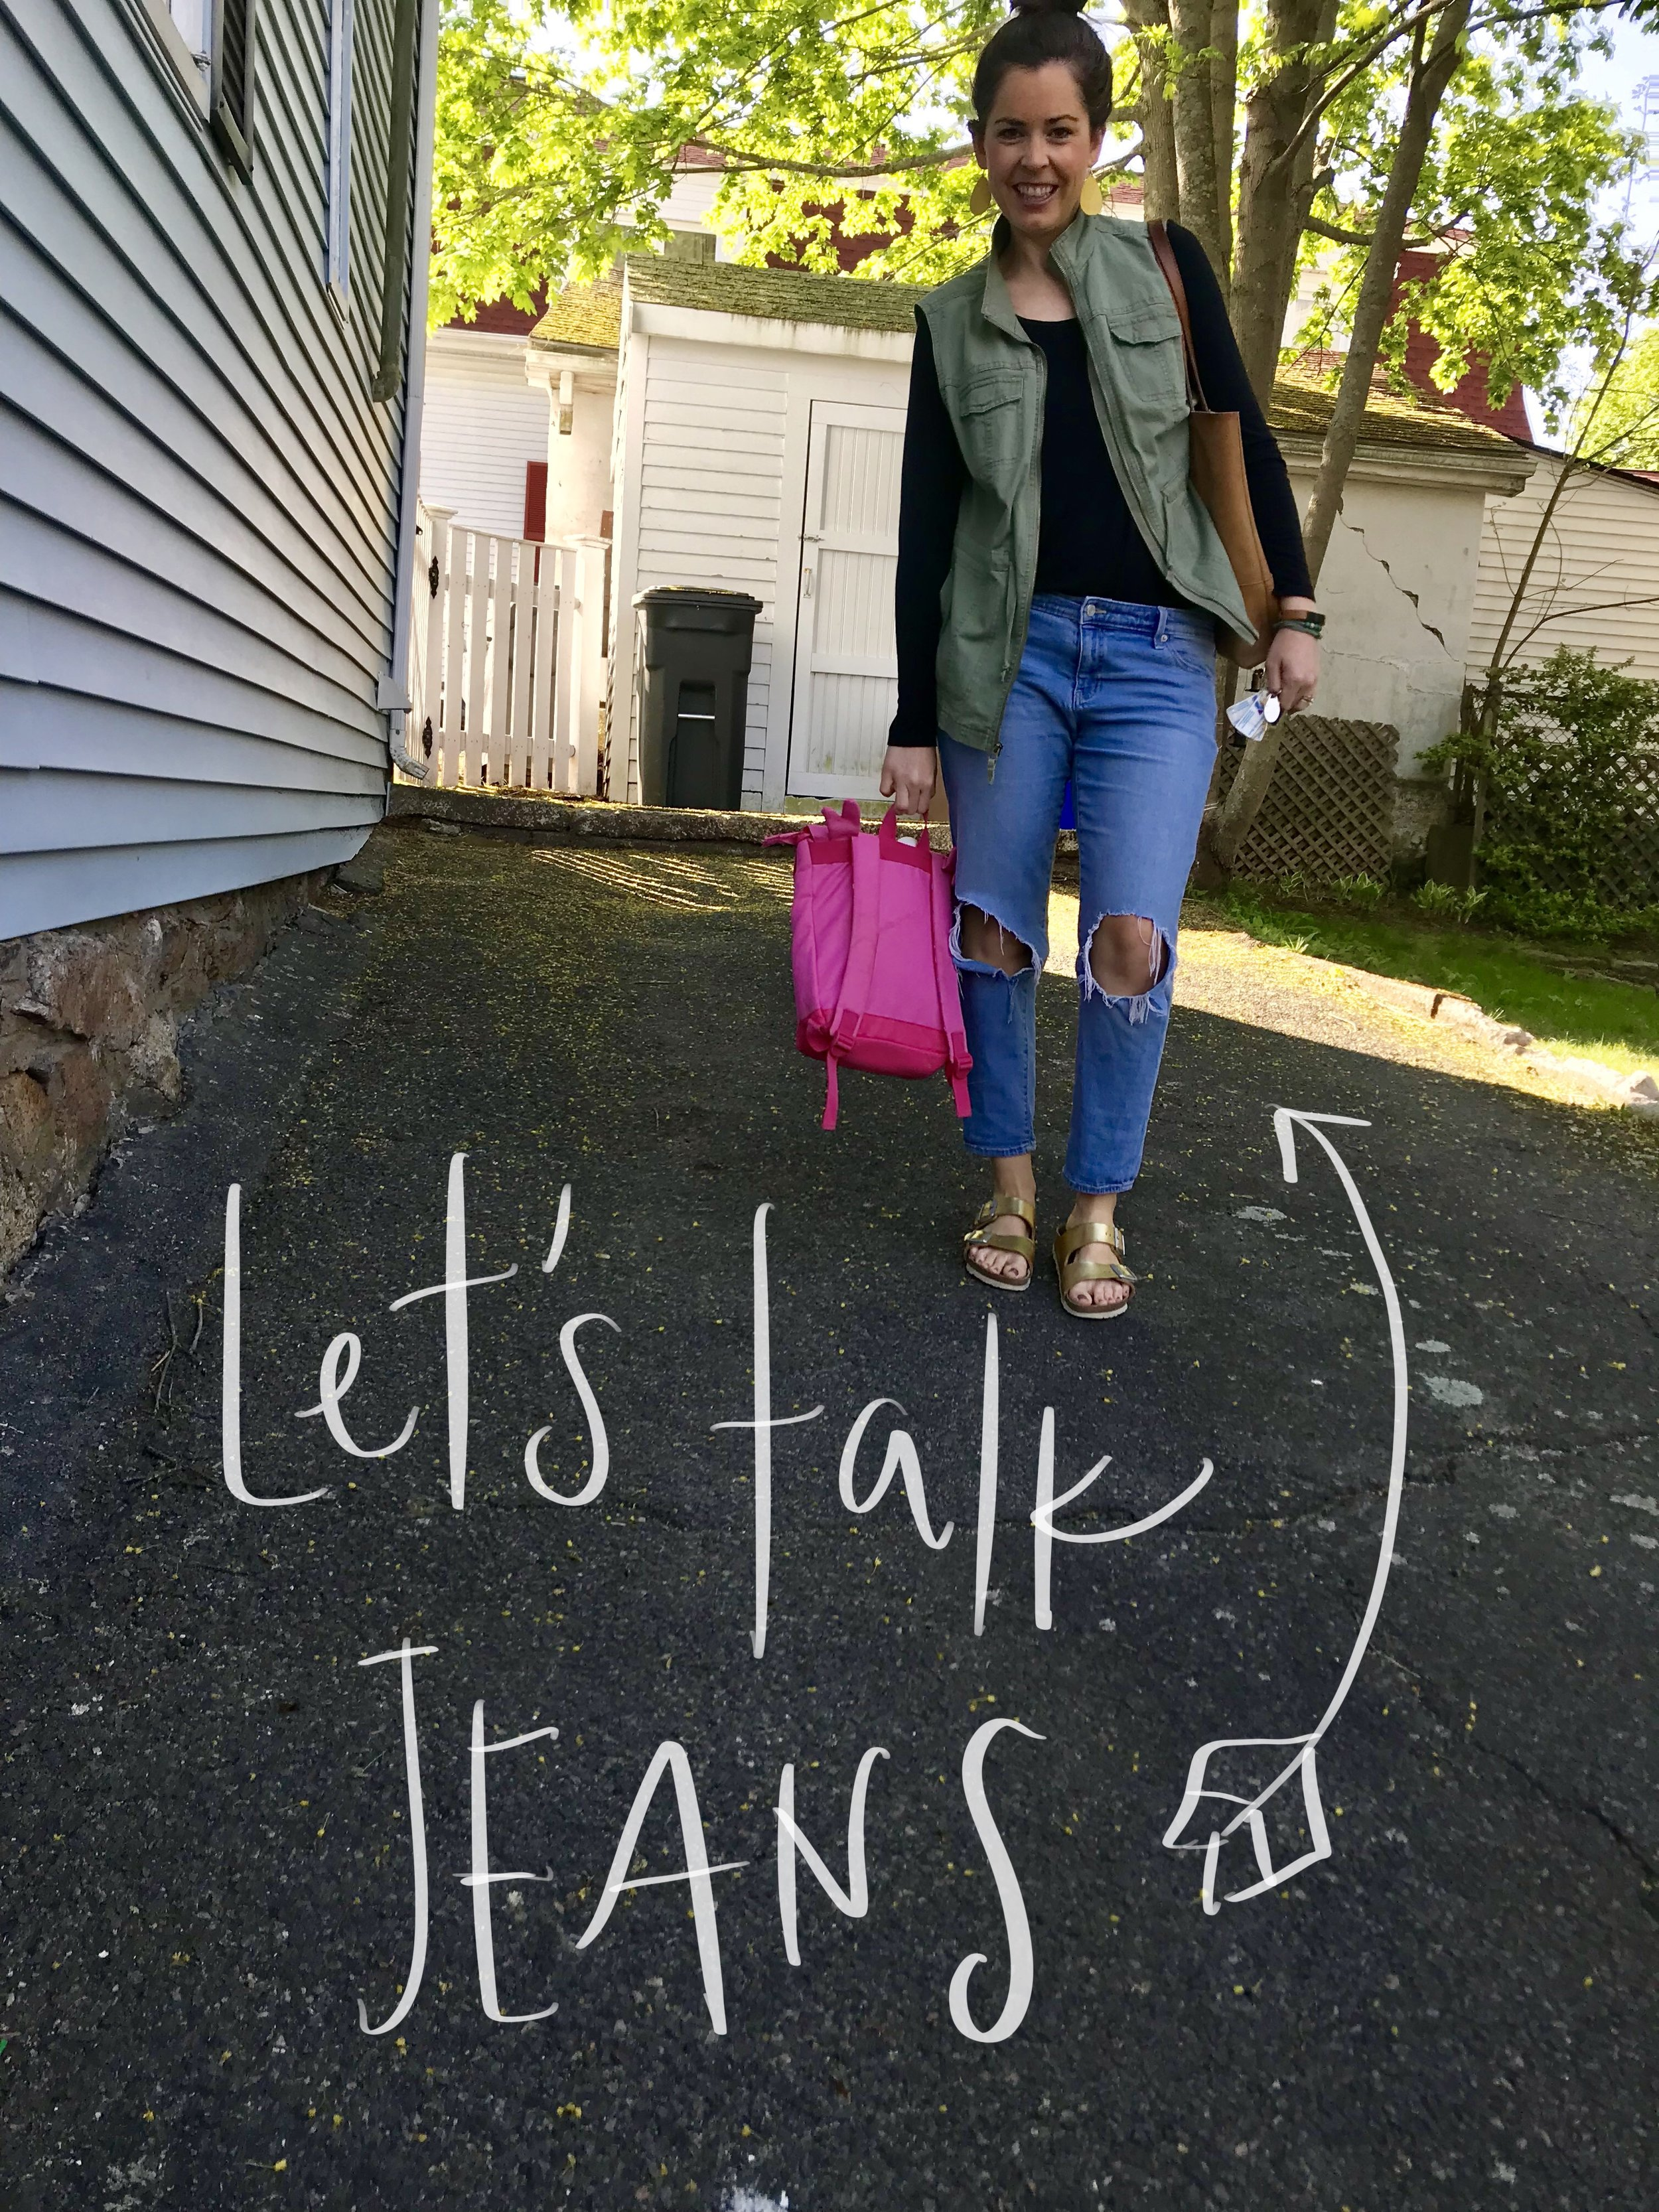 let's talk about jeans